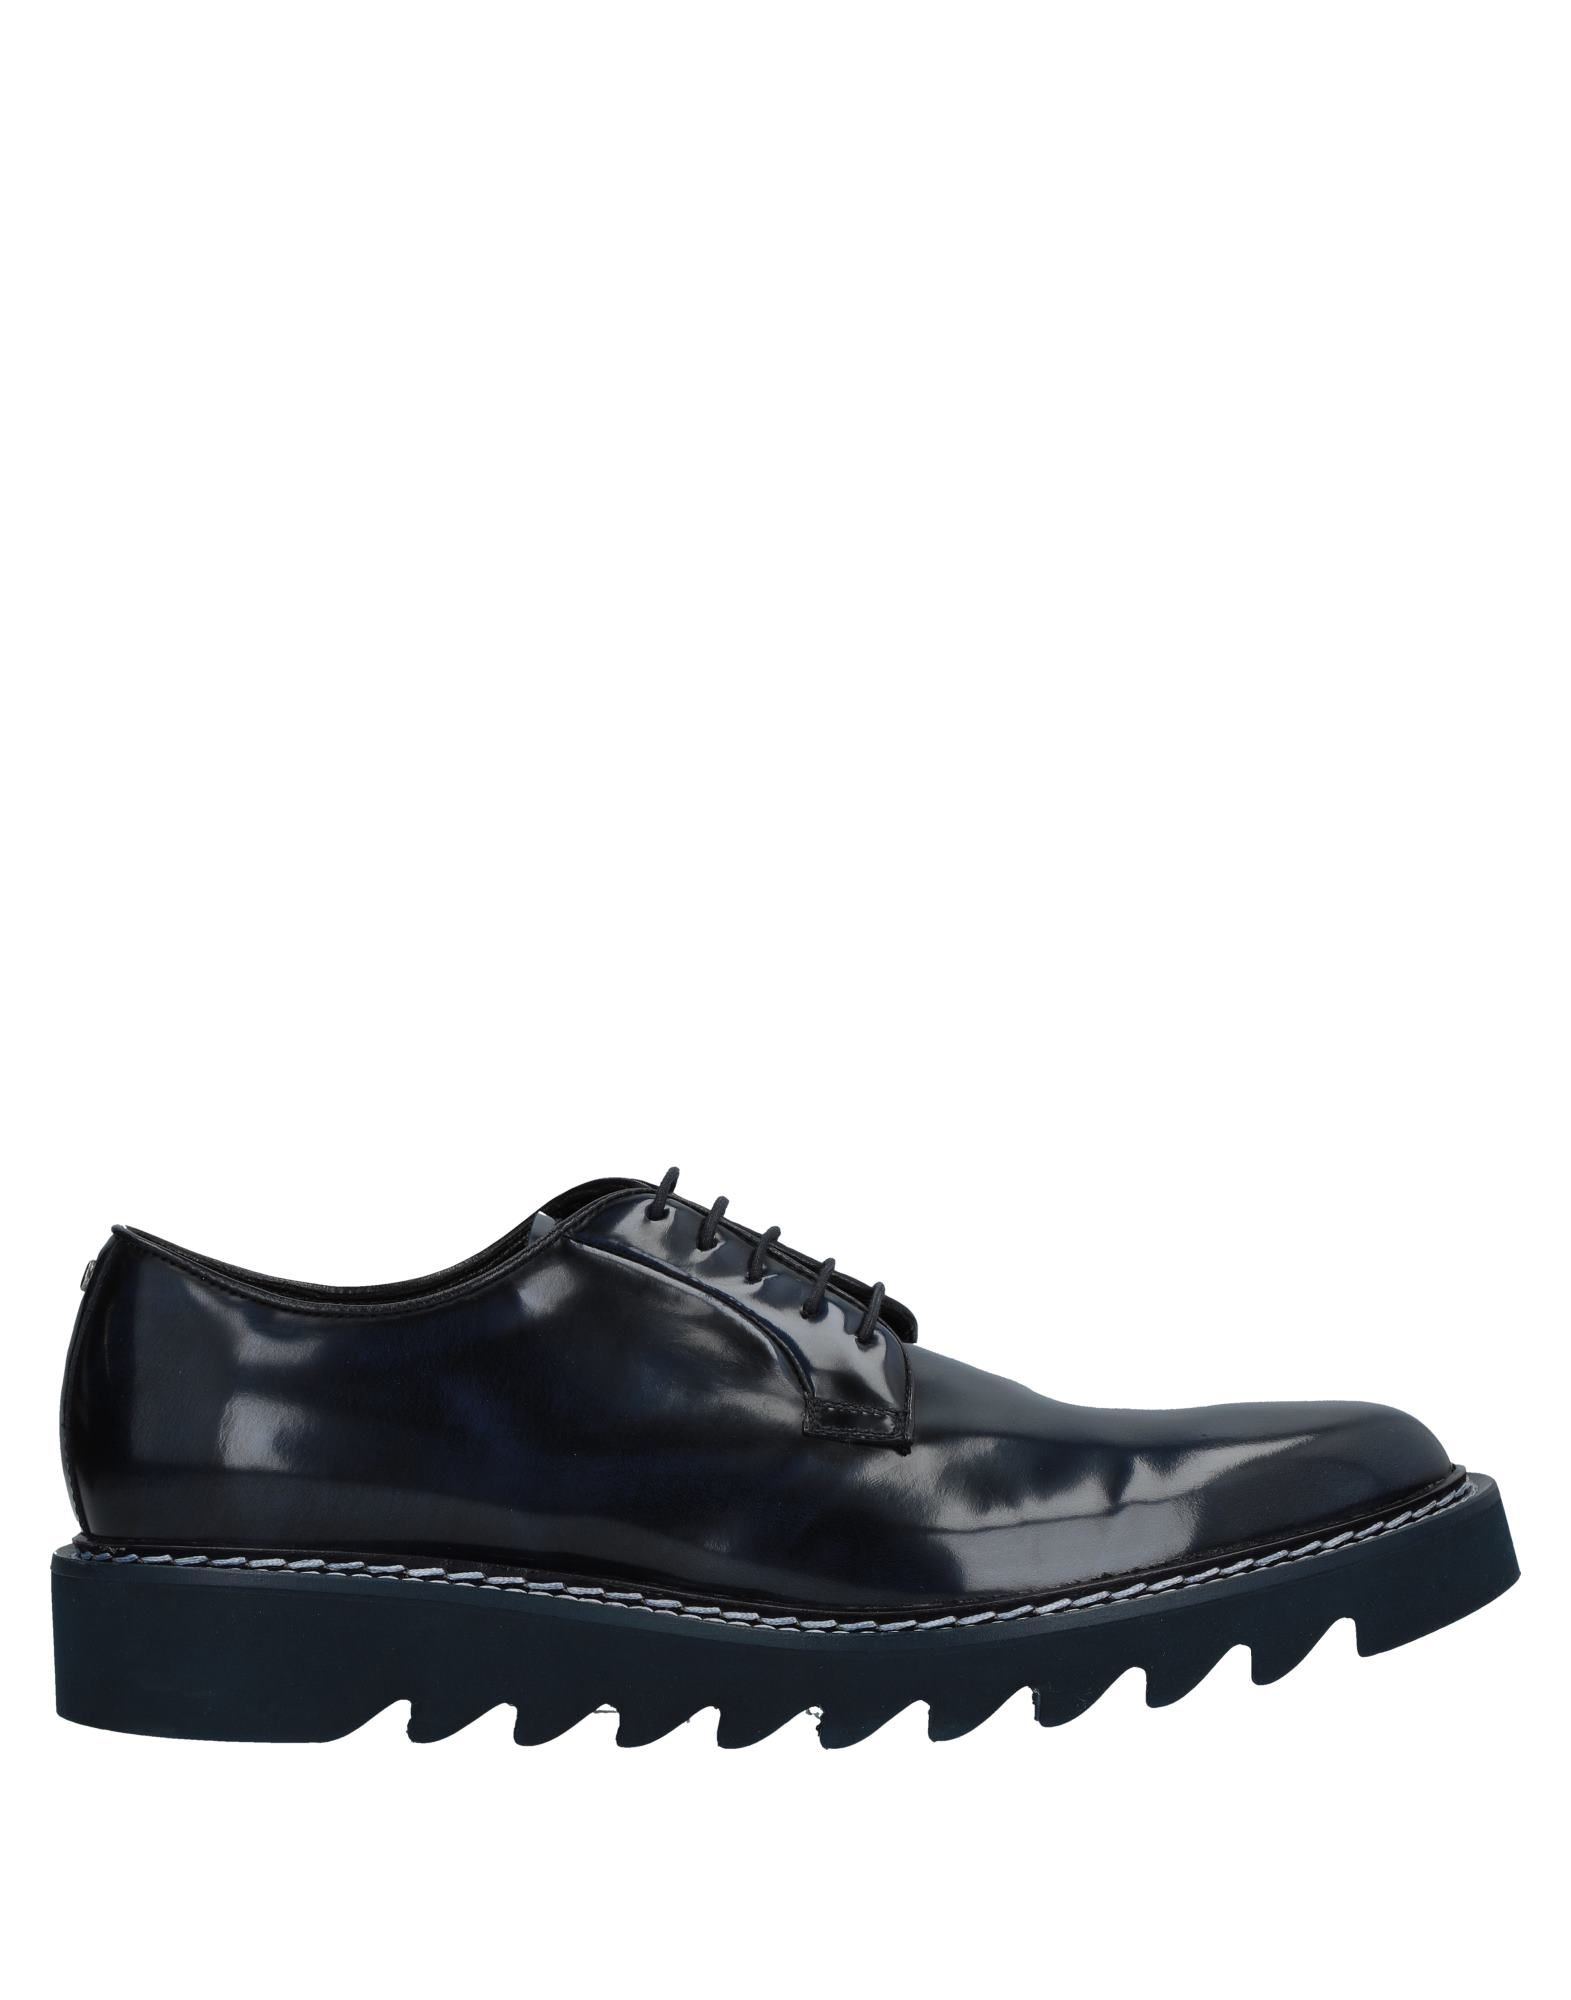 Cesare Paciotti Schnürschuhe Herren  11535183JP Gute Qualität beliebte Schuhe